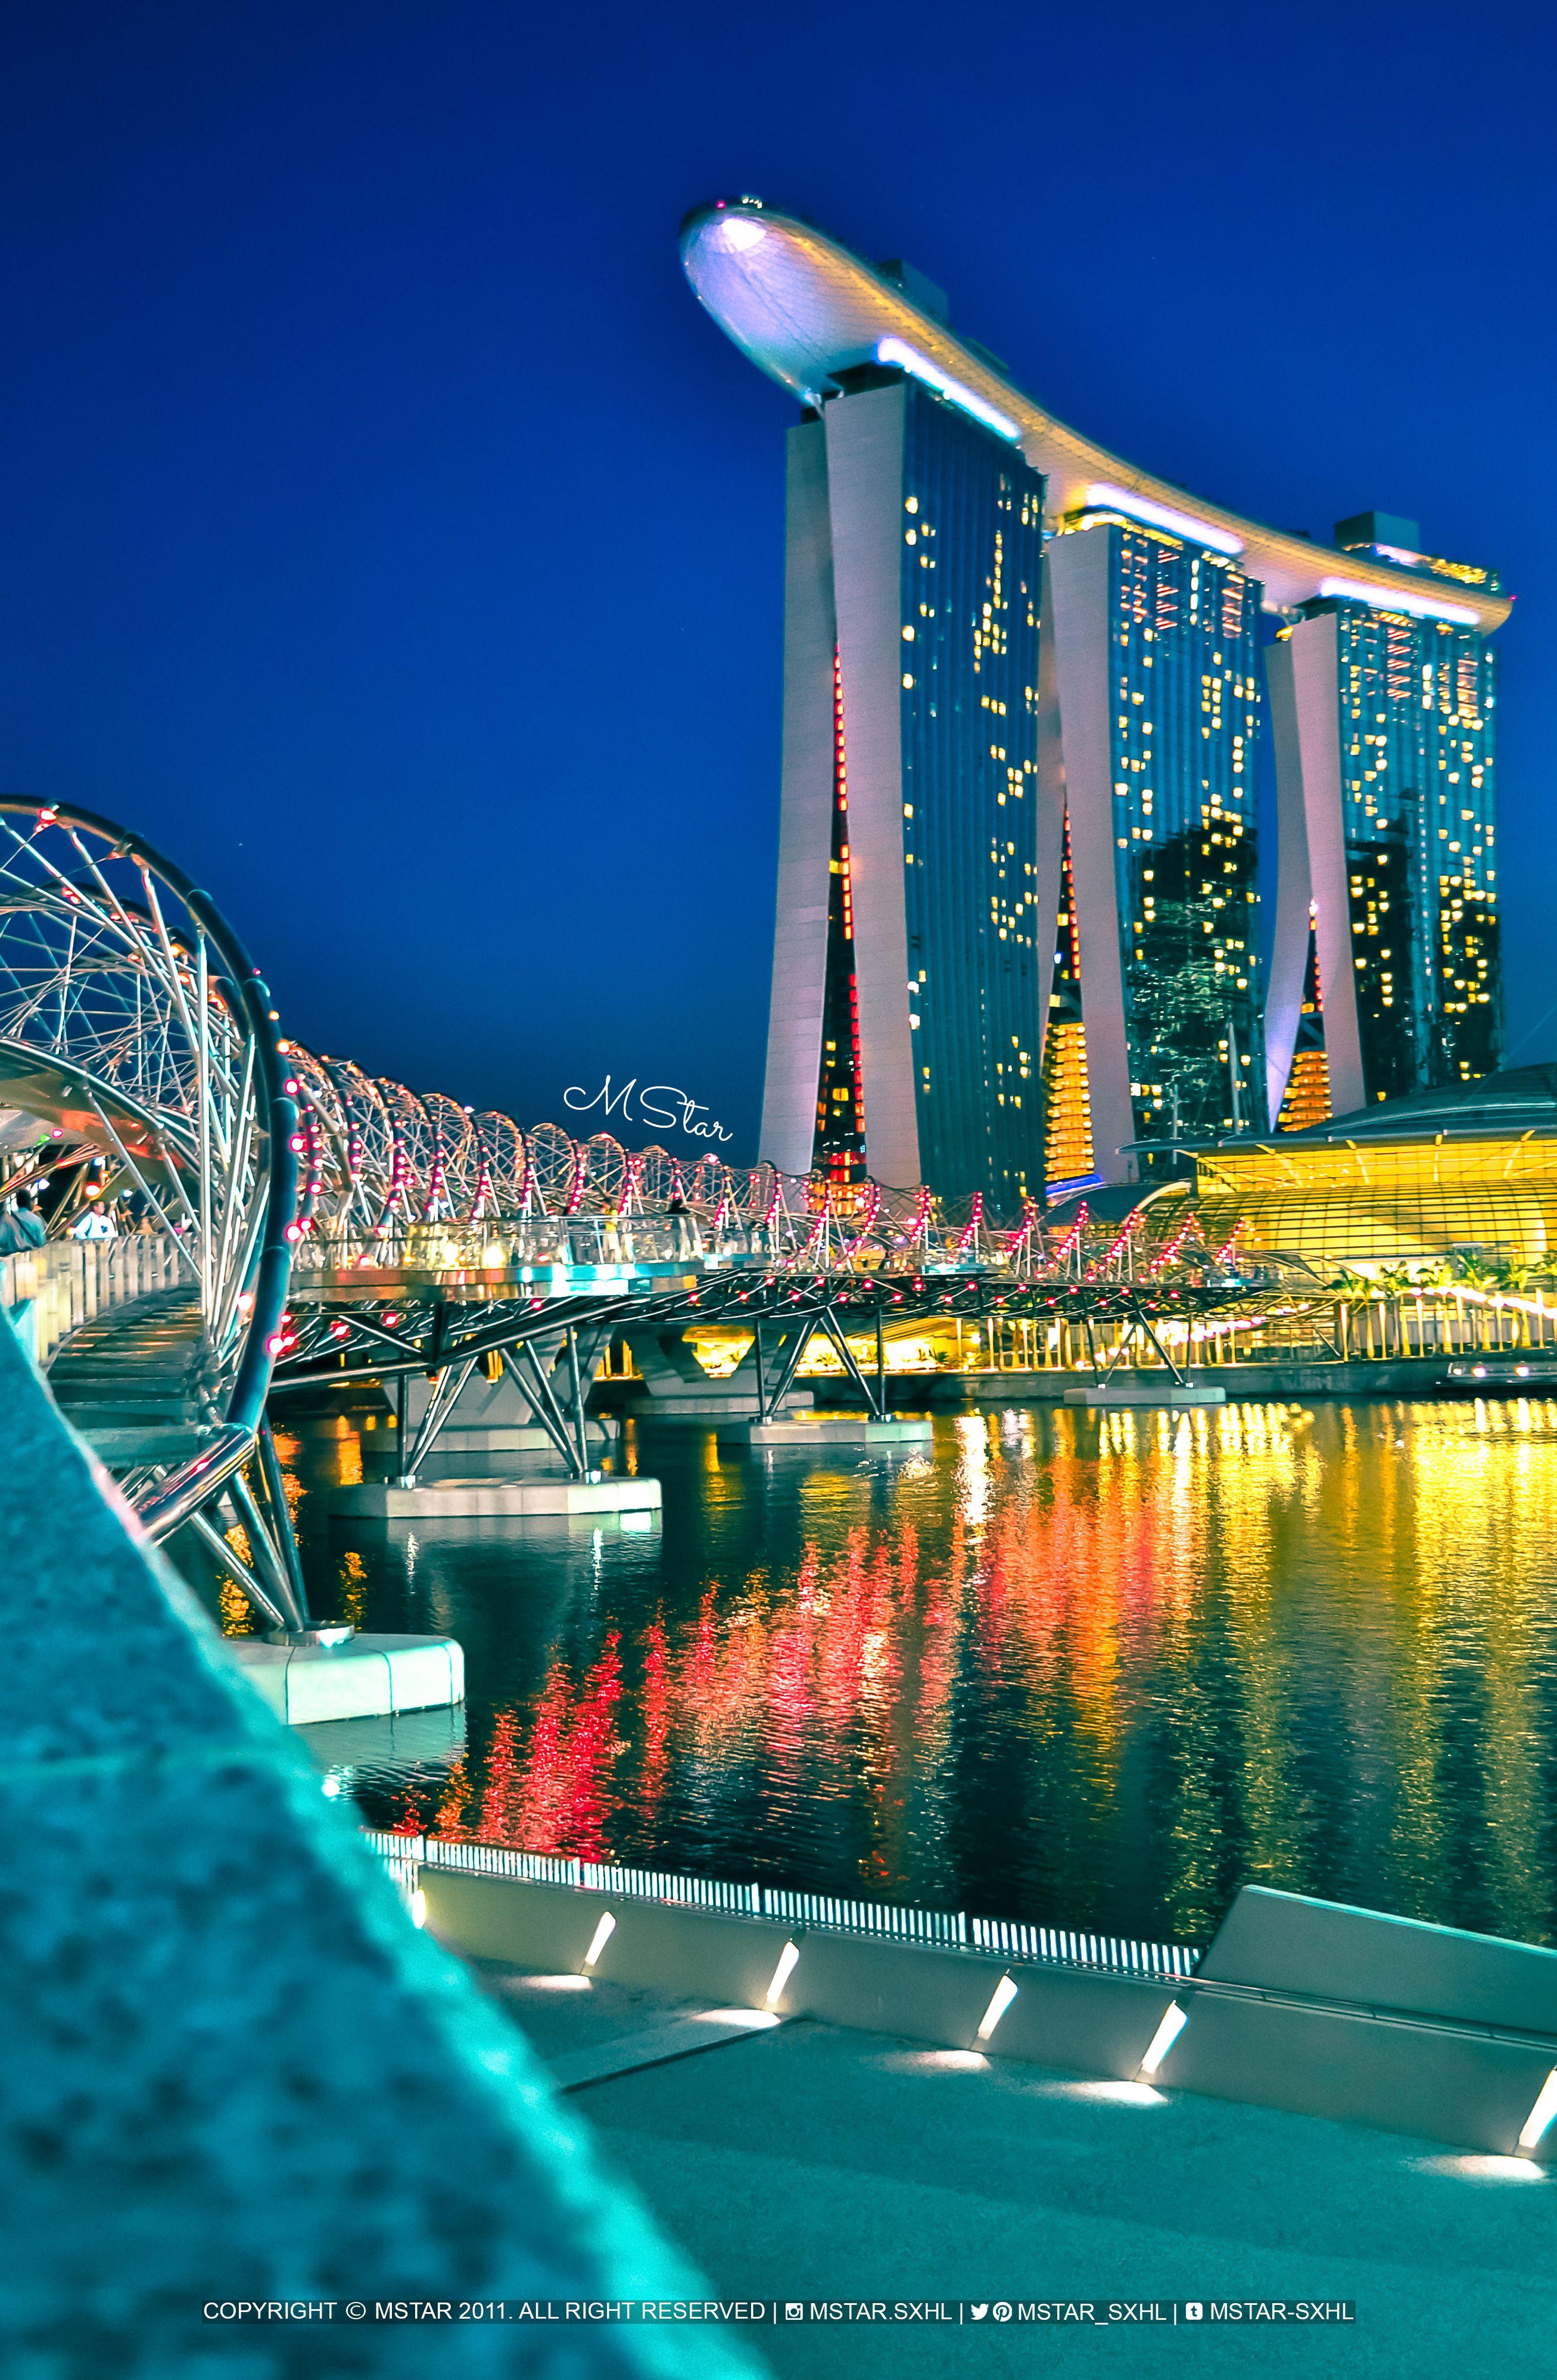 Tower Bridge Helix Glitch : tower, bridge, helix, glitch, Helix, Bridge,, Singapore, Marina, South,, Area,, Sands